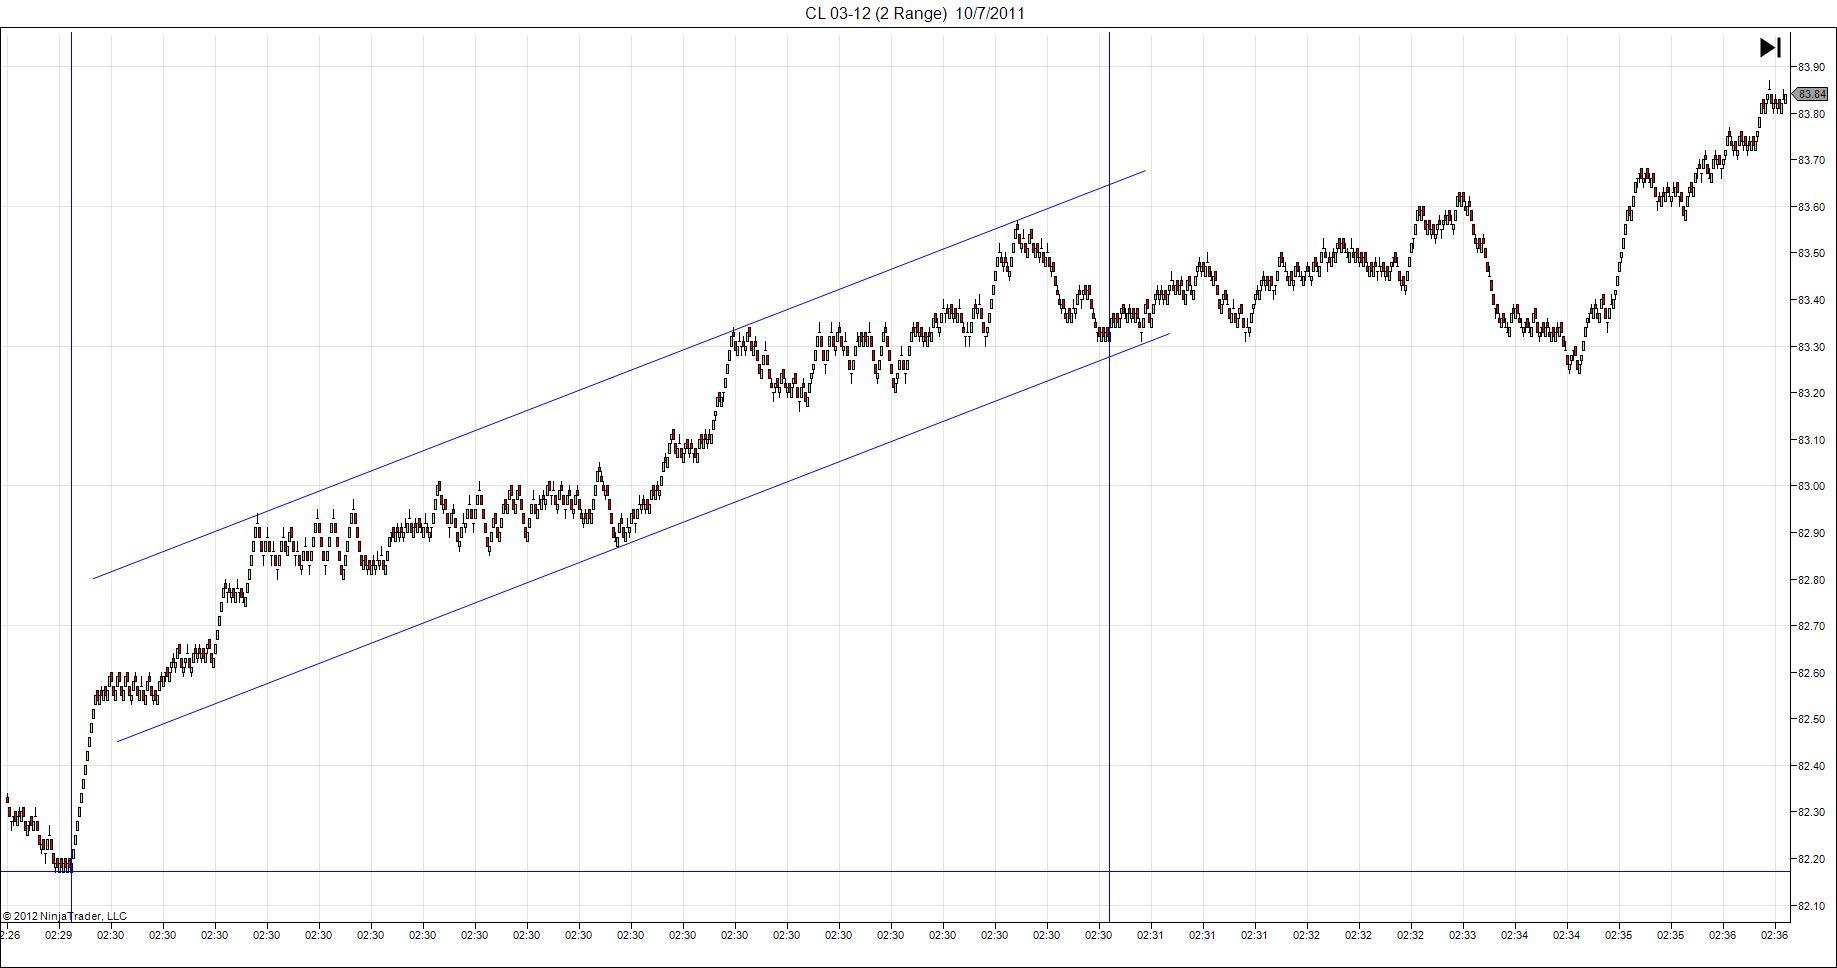 CL 03 12 (2 Range) 10.07.11